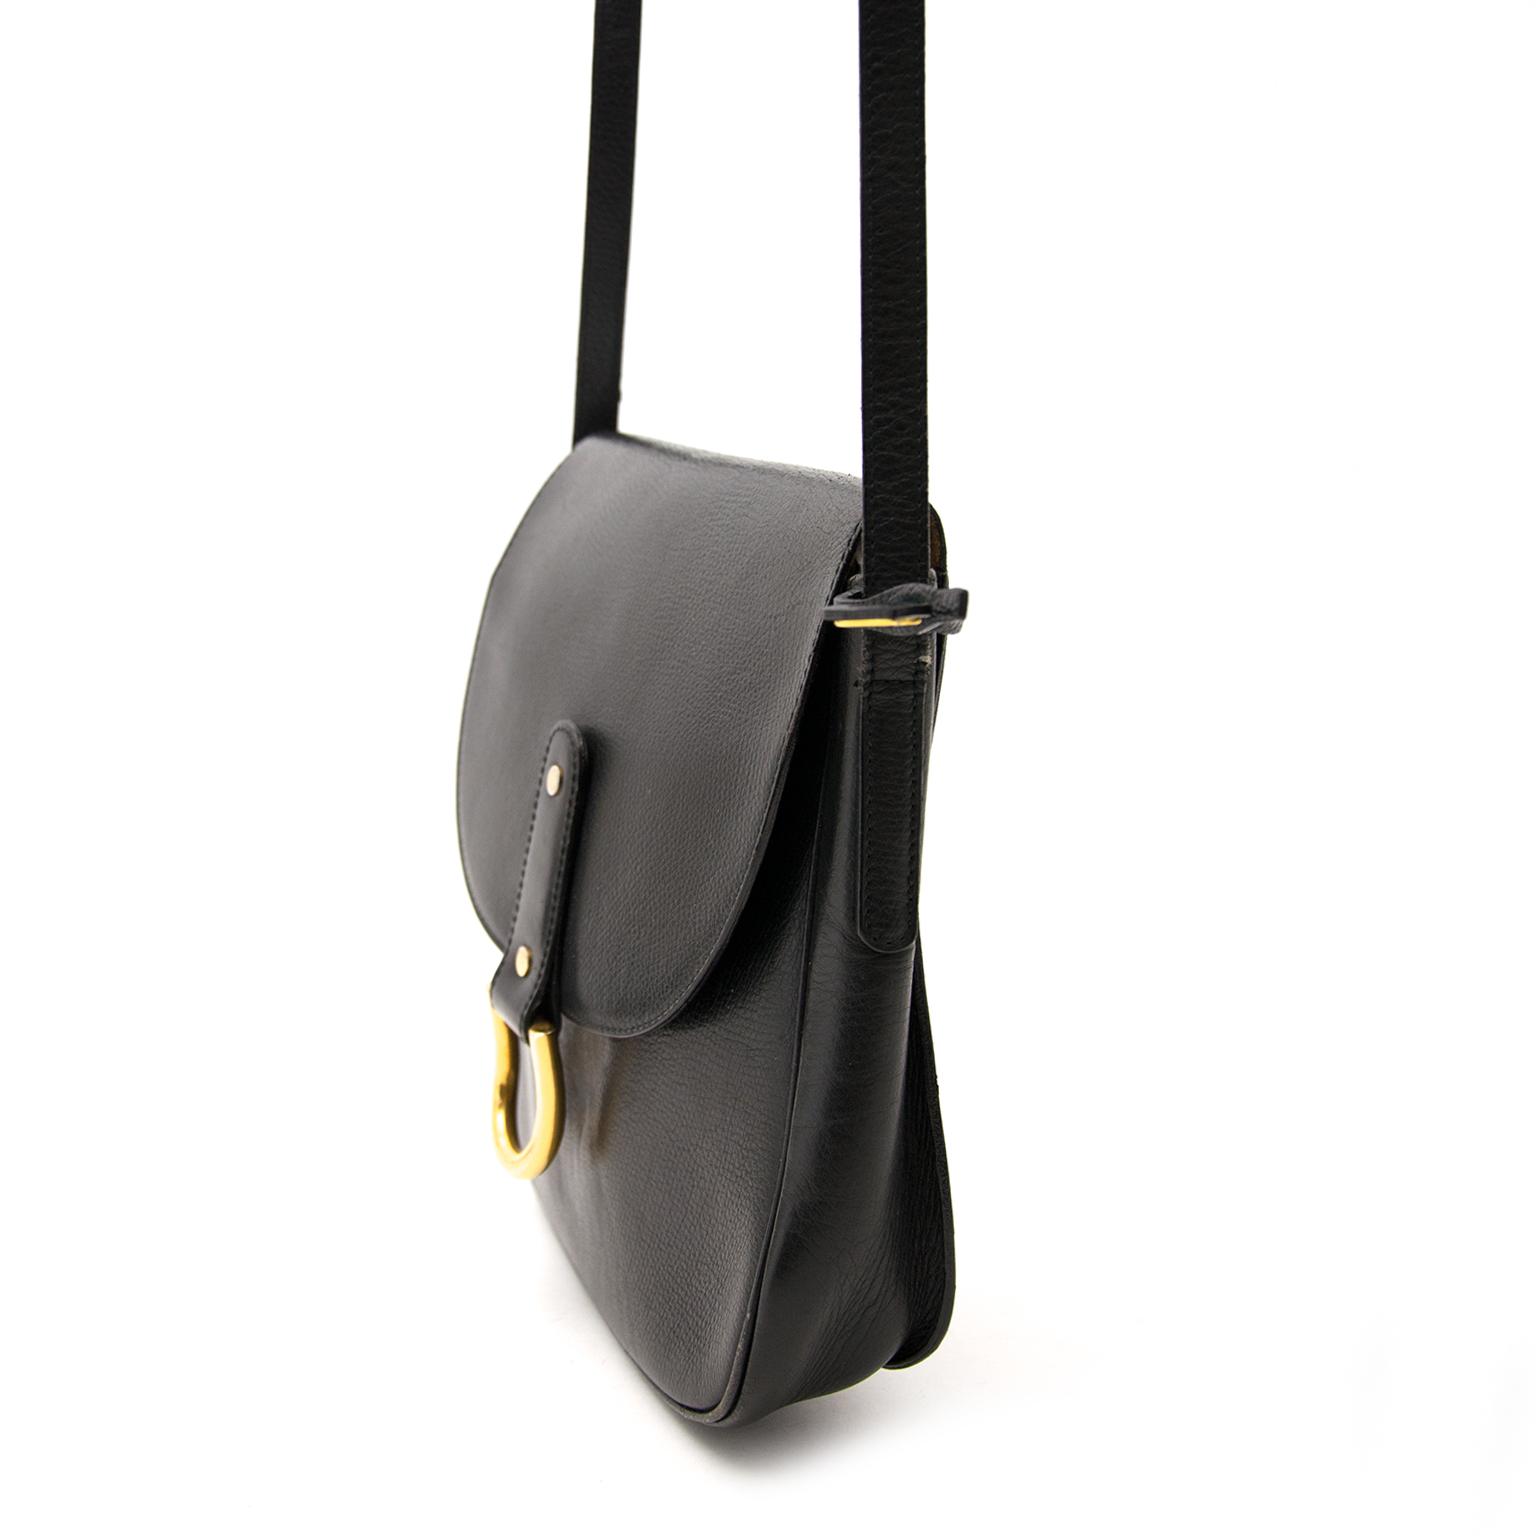 Buy a secondhand Delvaux black crossbody bag online